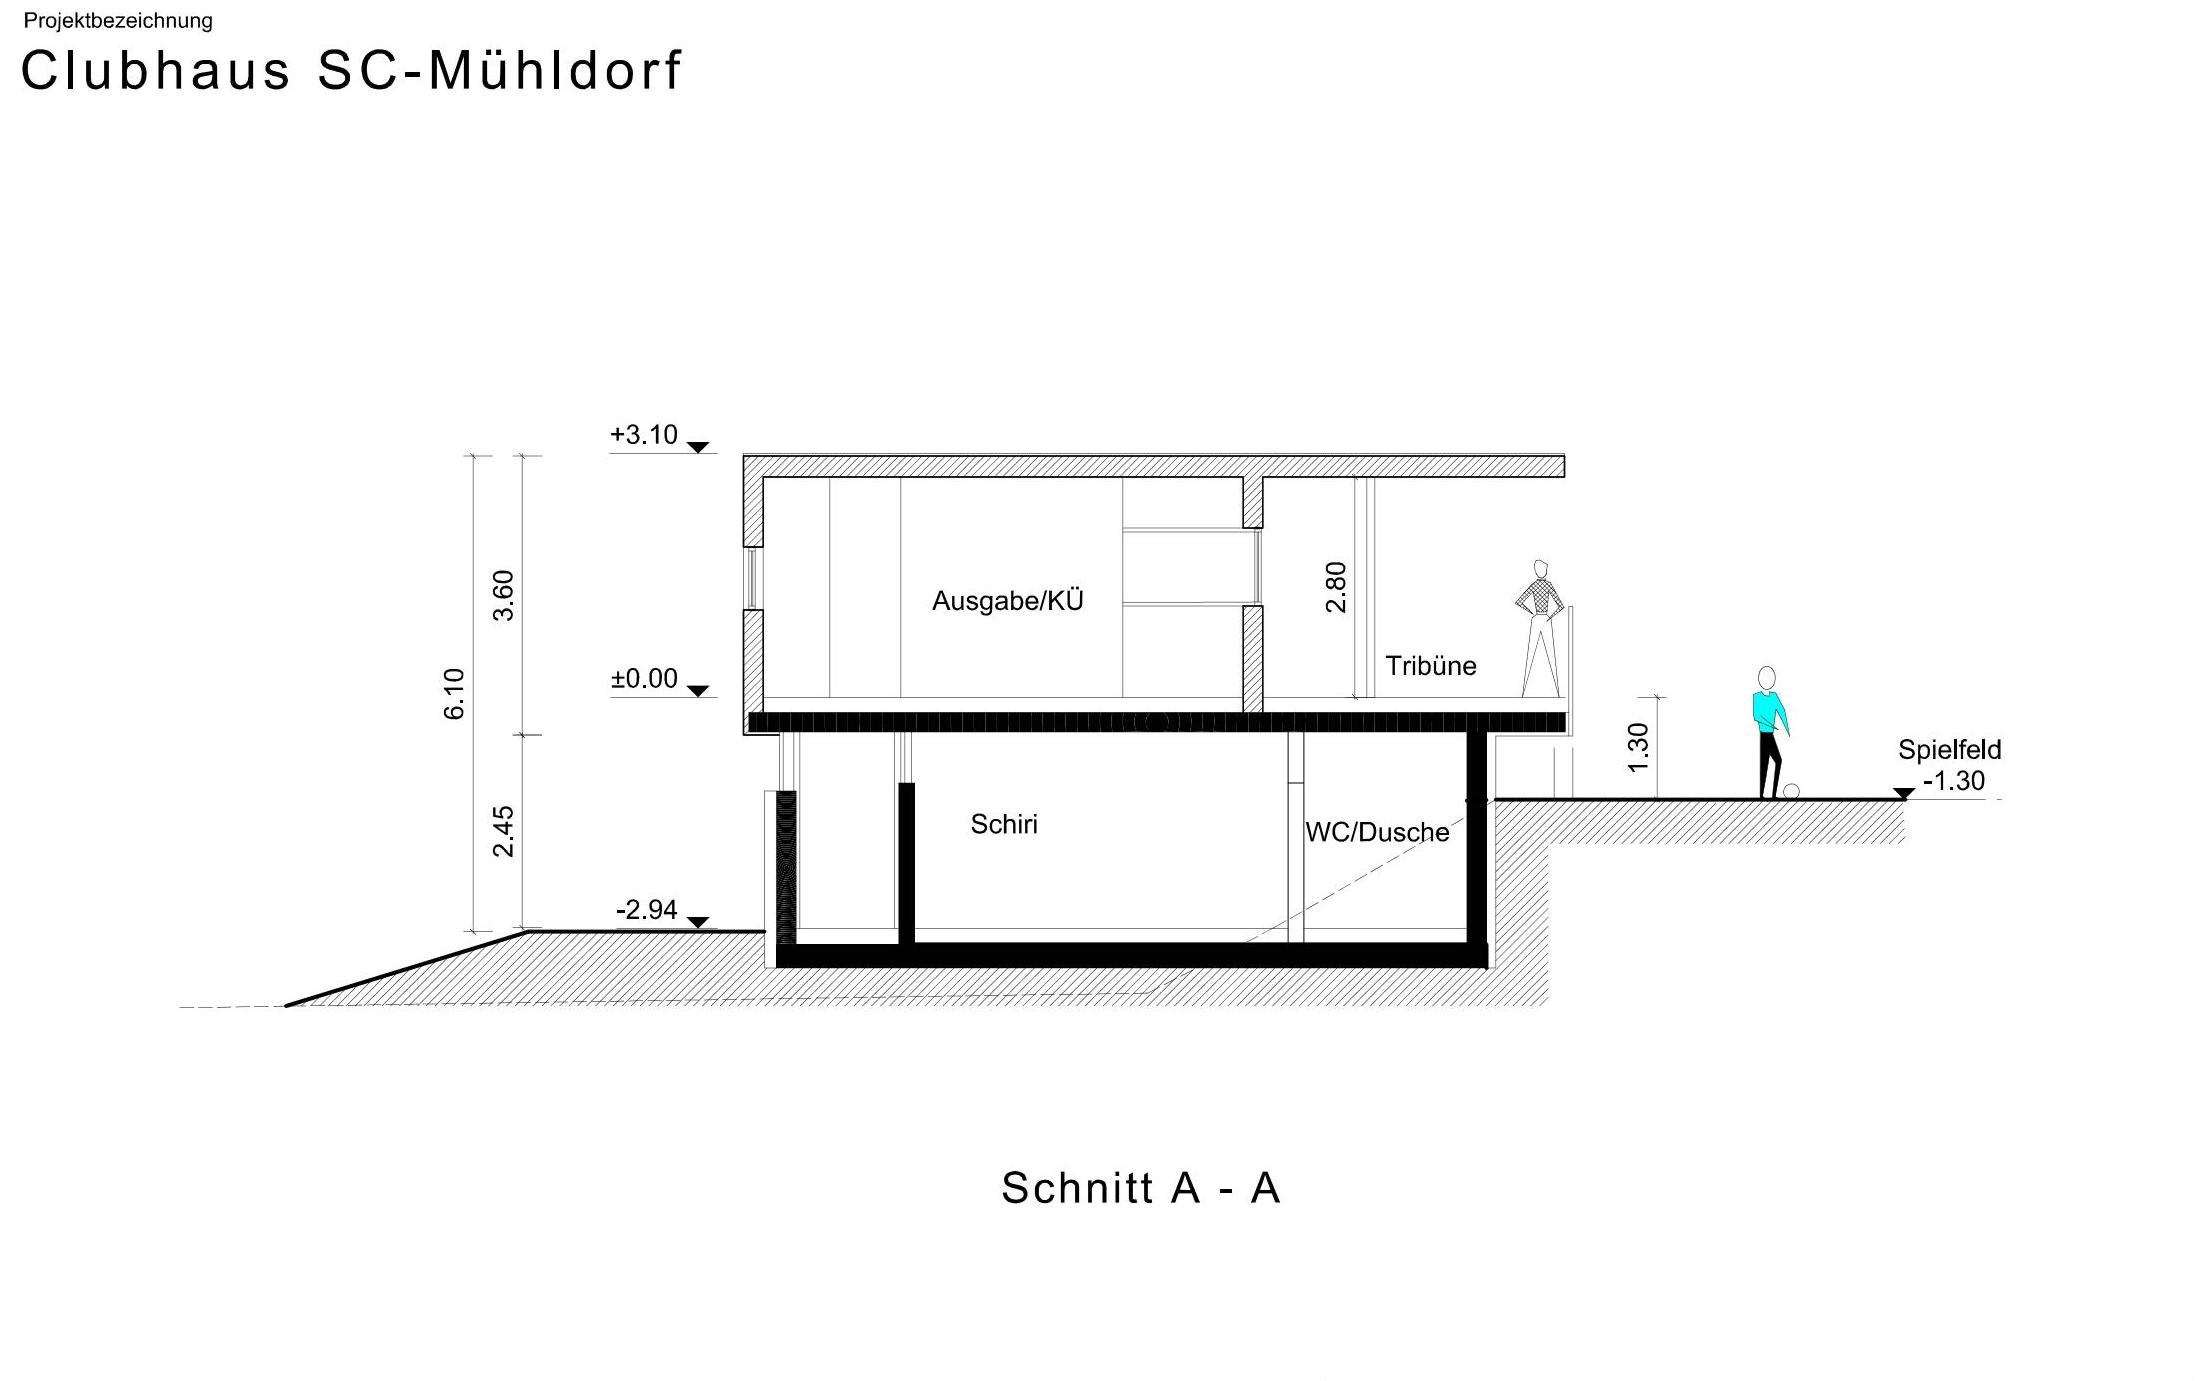 https://0501.nccdn.net/4_2/000/000/017/e75/Landesbaupreis-2008_SC-Clubhaus-M--hldorf_Schnitt-A-A_Page_1-2195x1381.jpg